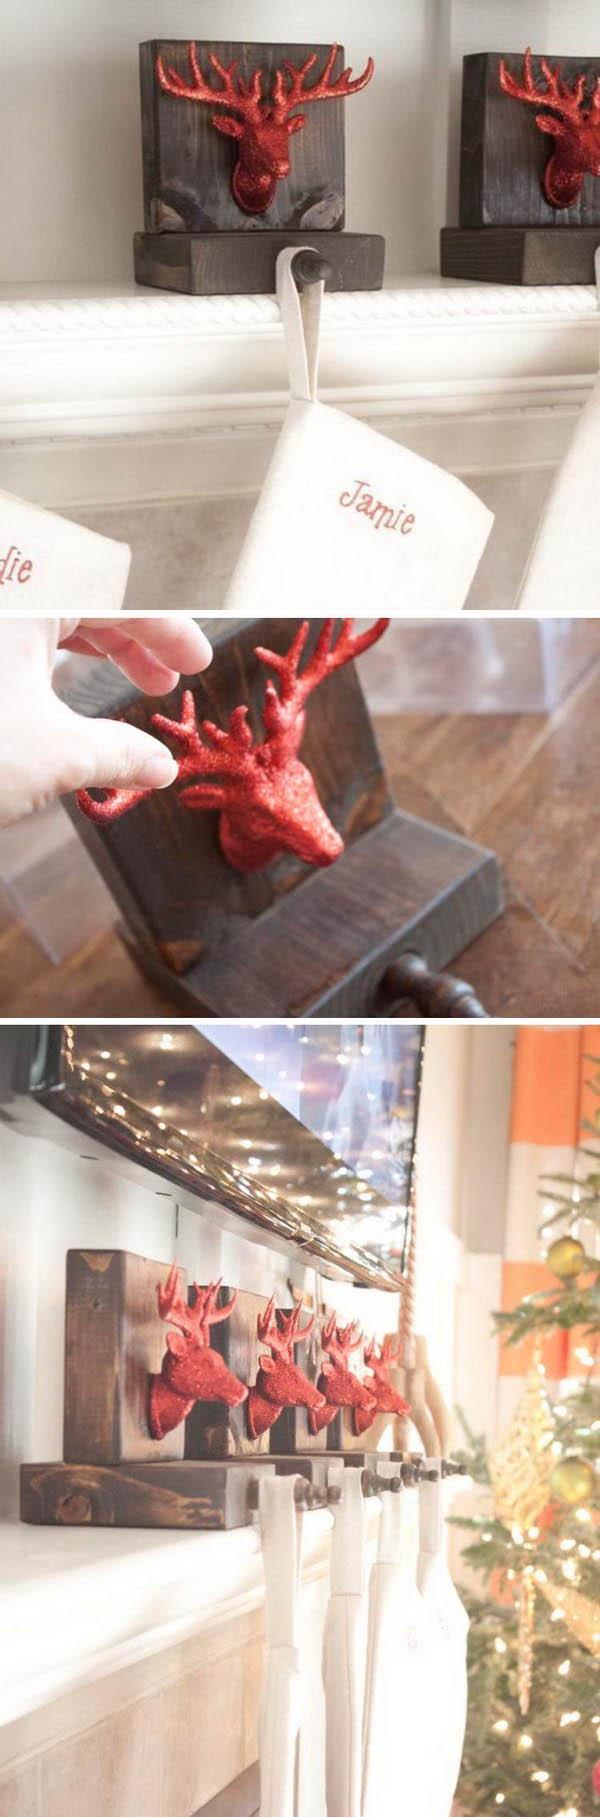 DIY Wooden Reindeer Stocking Holders